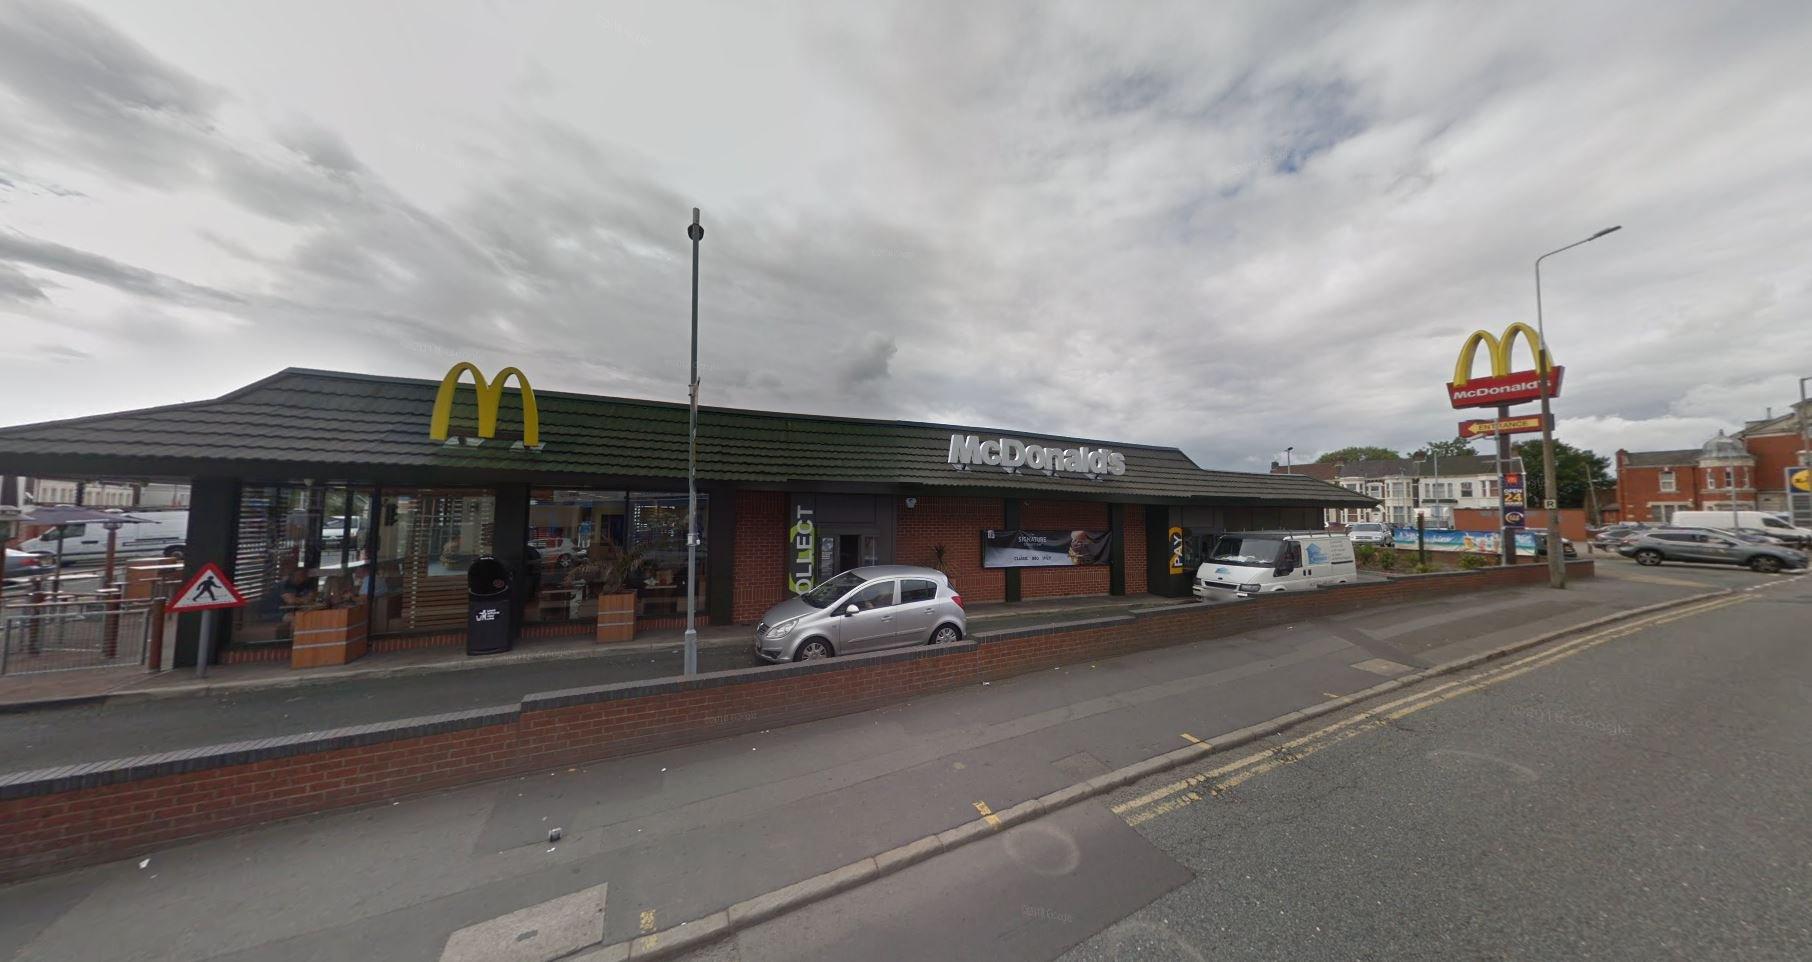 Man found dead in McDonald's toilet